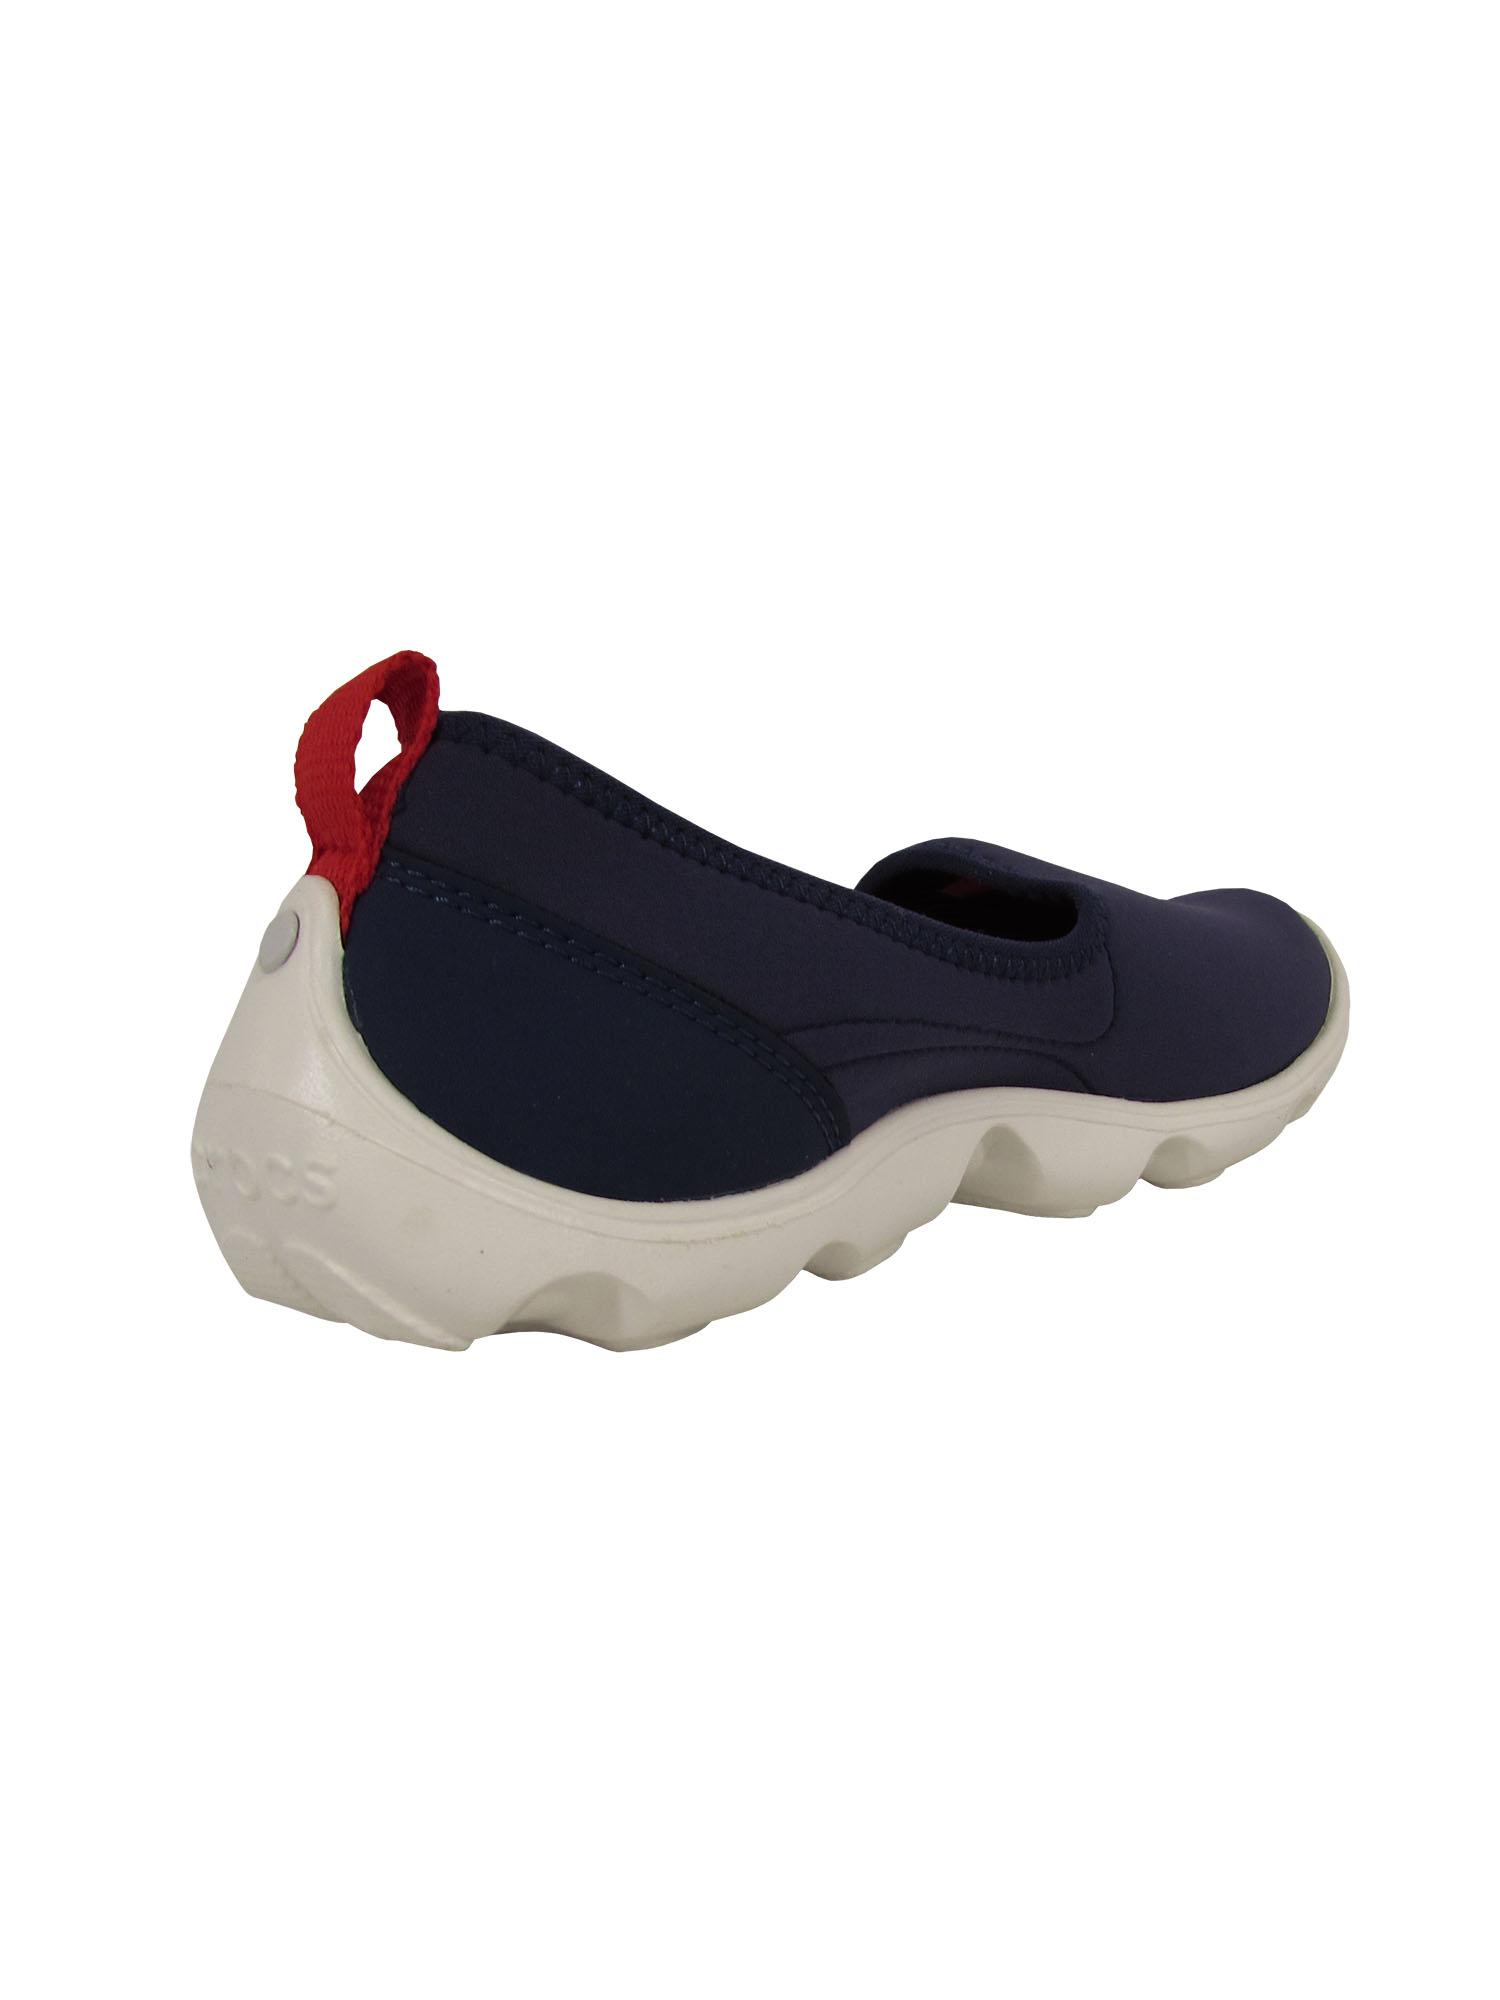 Crocs-Womens-Duet-Busy-Day-Skimmer-Flat-Shoes thumbnail 19